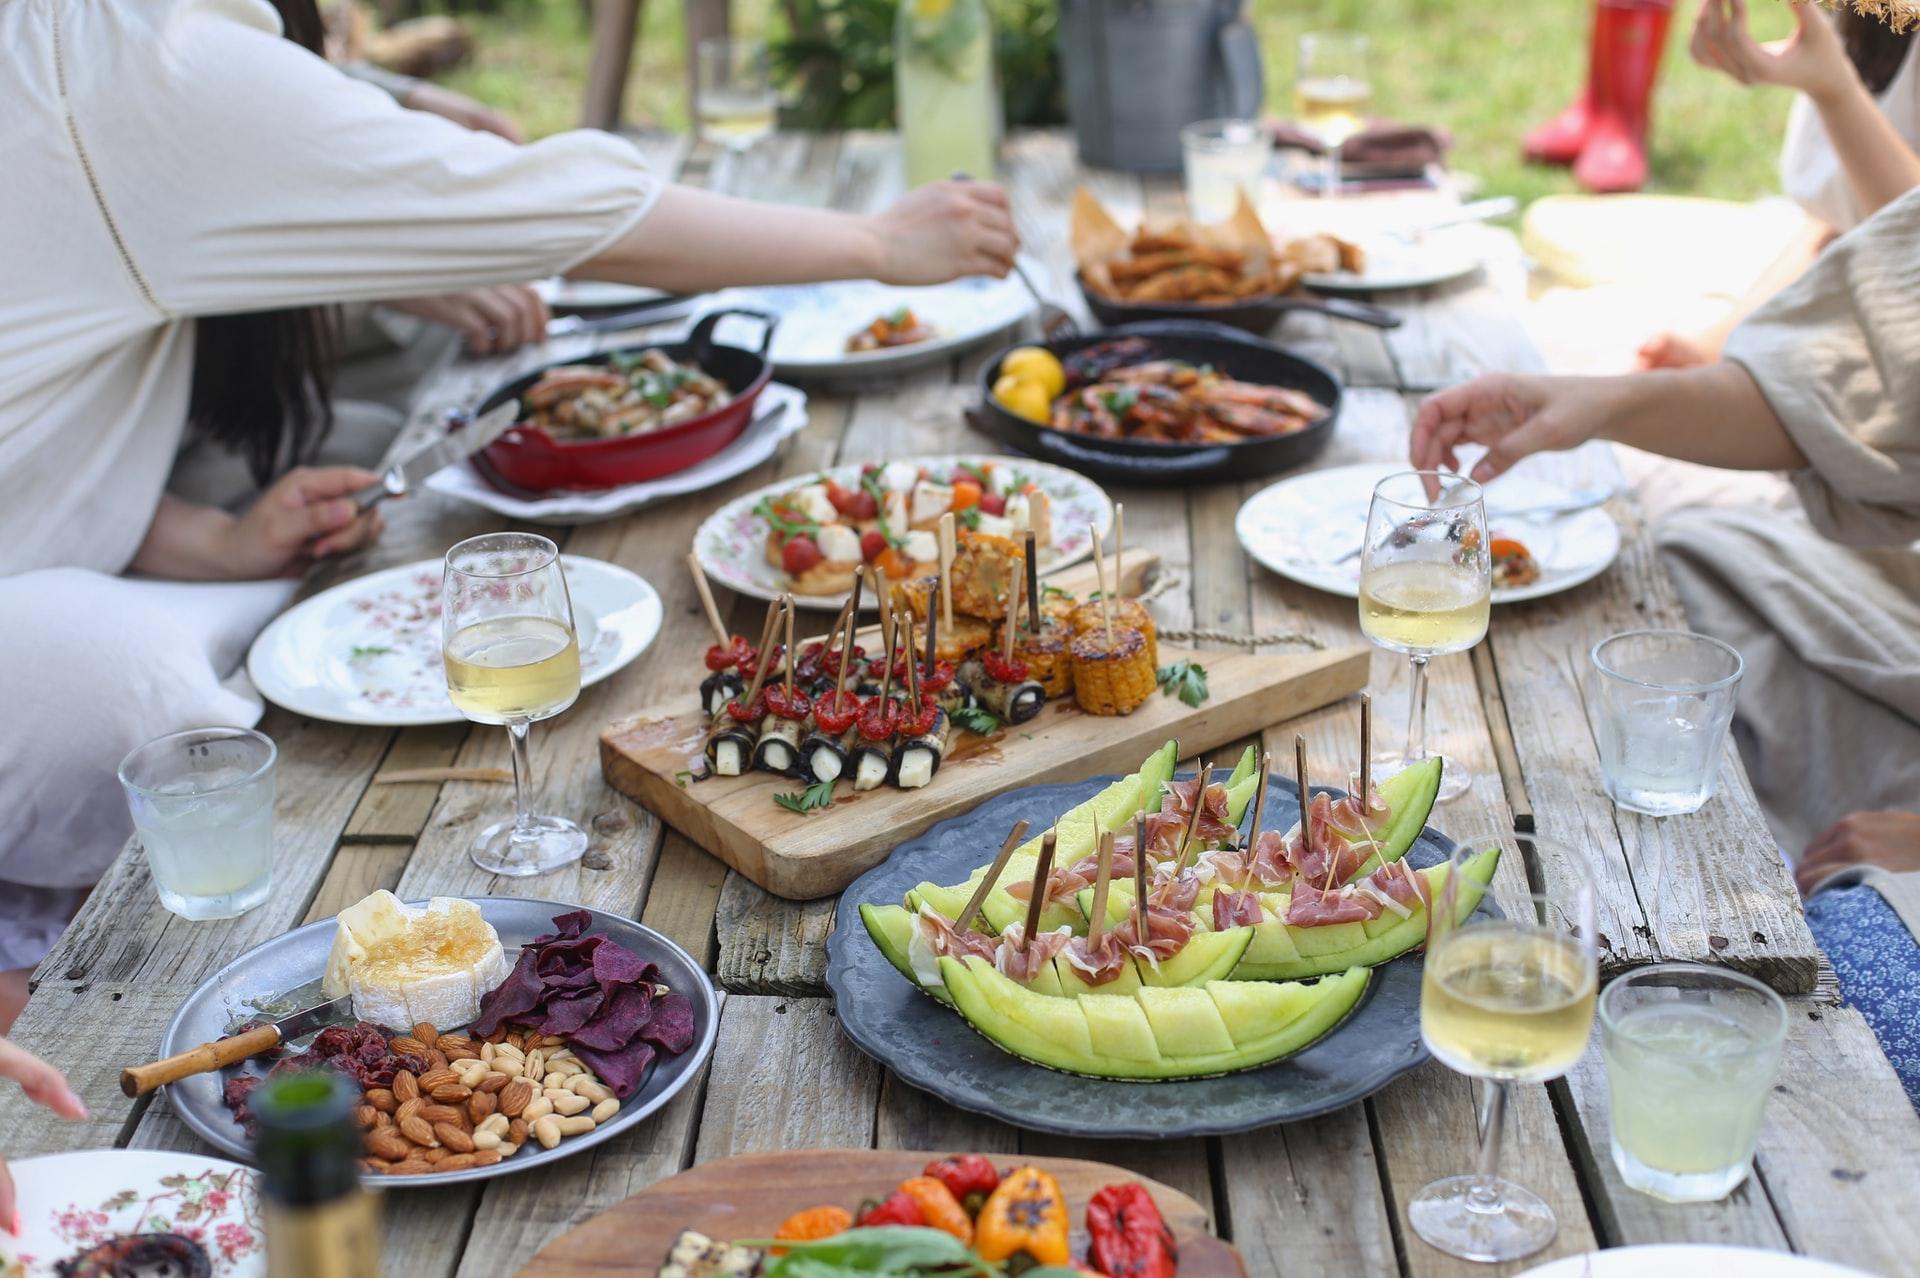 Leuk feestje in de tuin met leuke tuinmeubelen